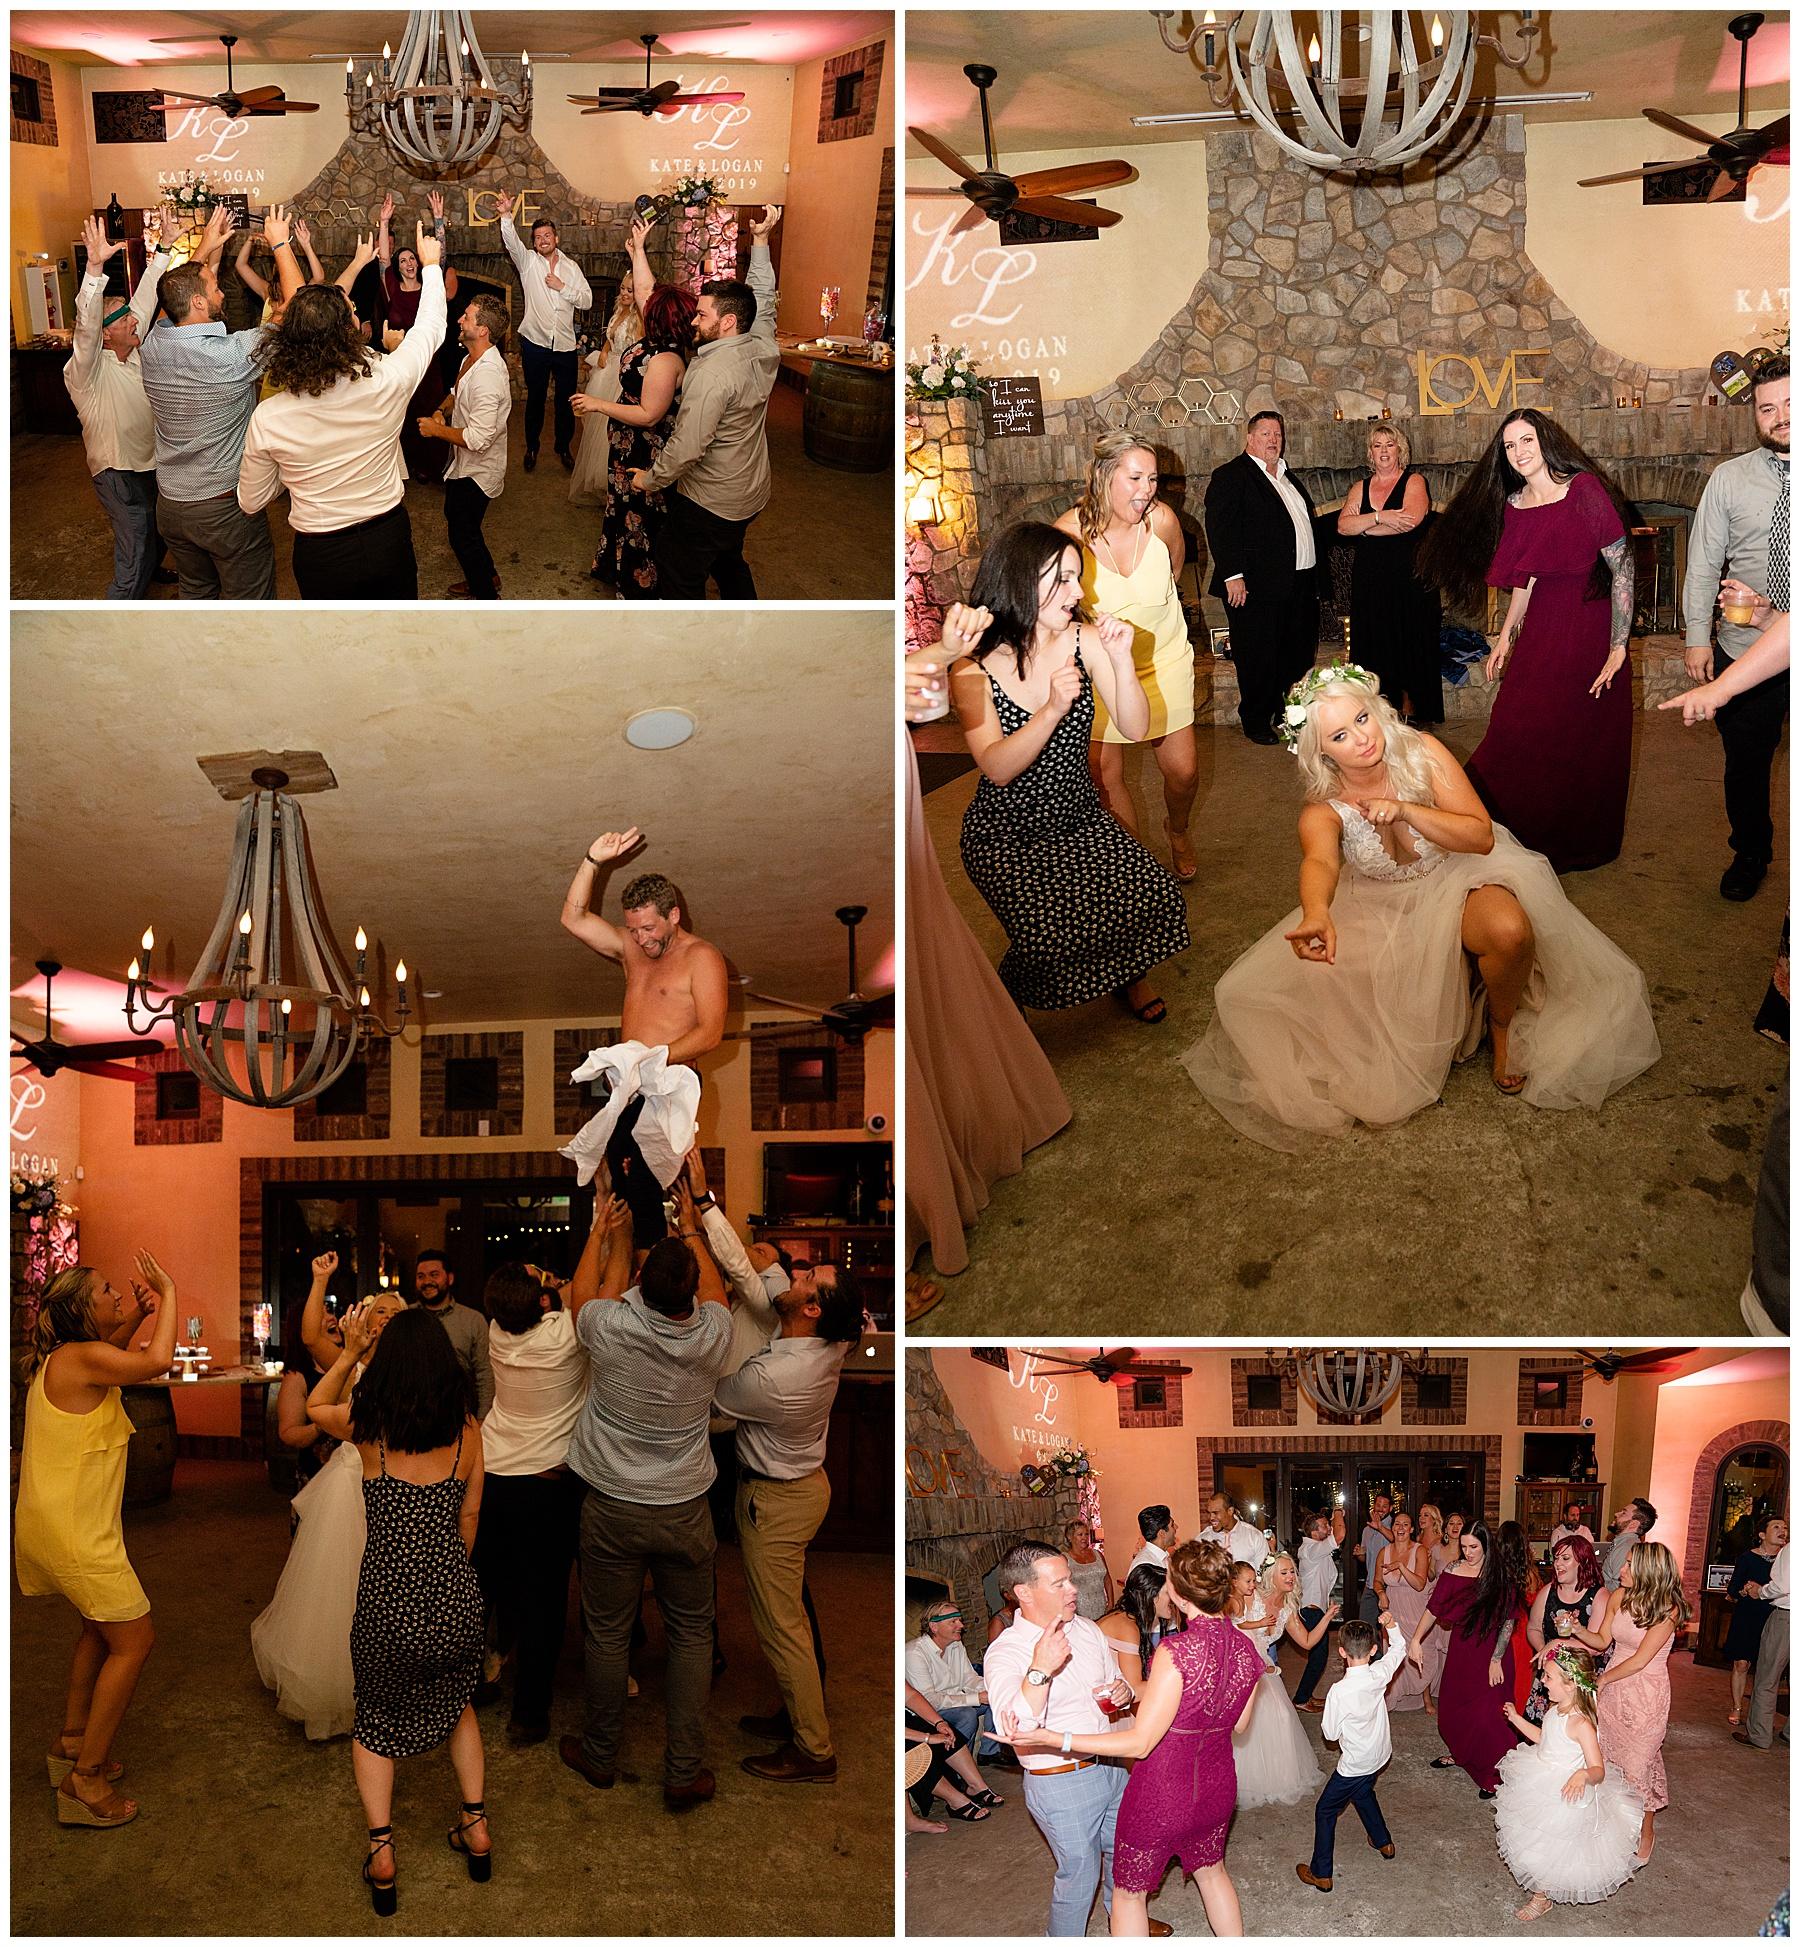 lake oak meadows weddings and events temecula ca dancing